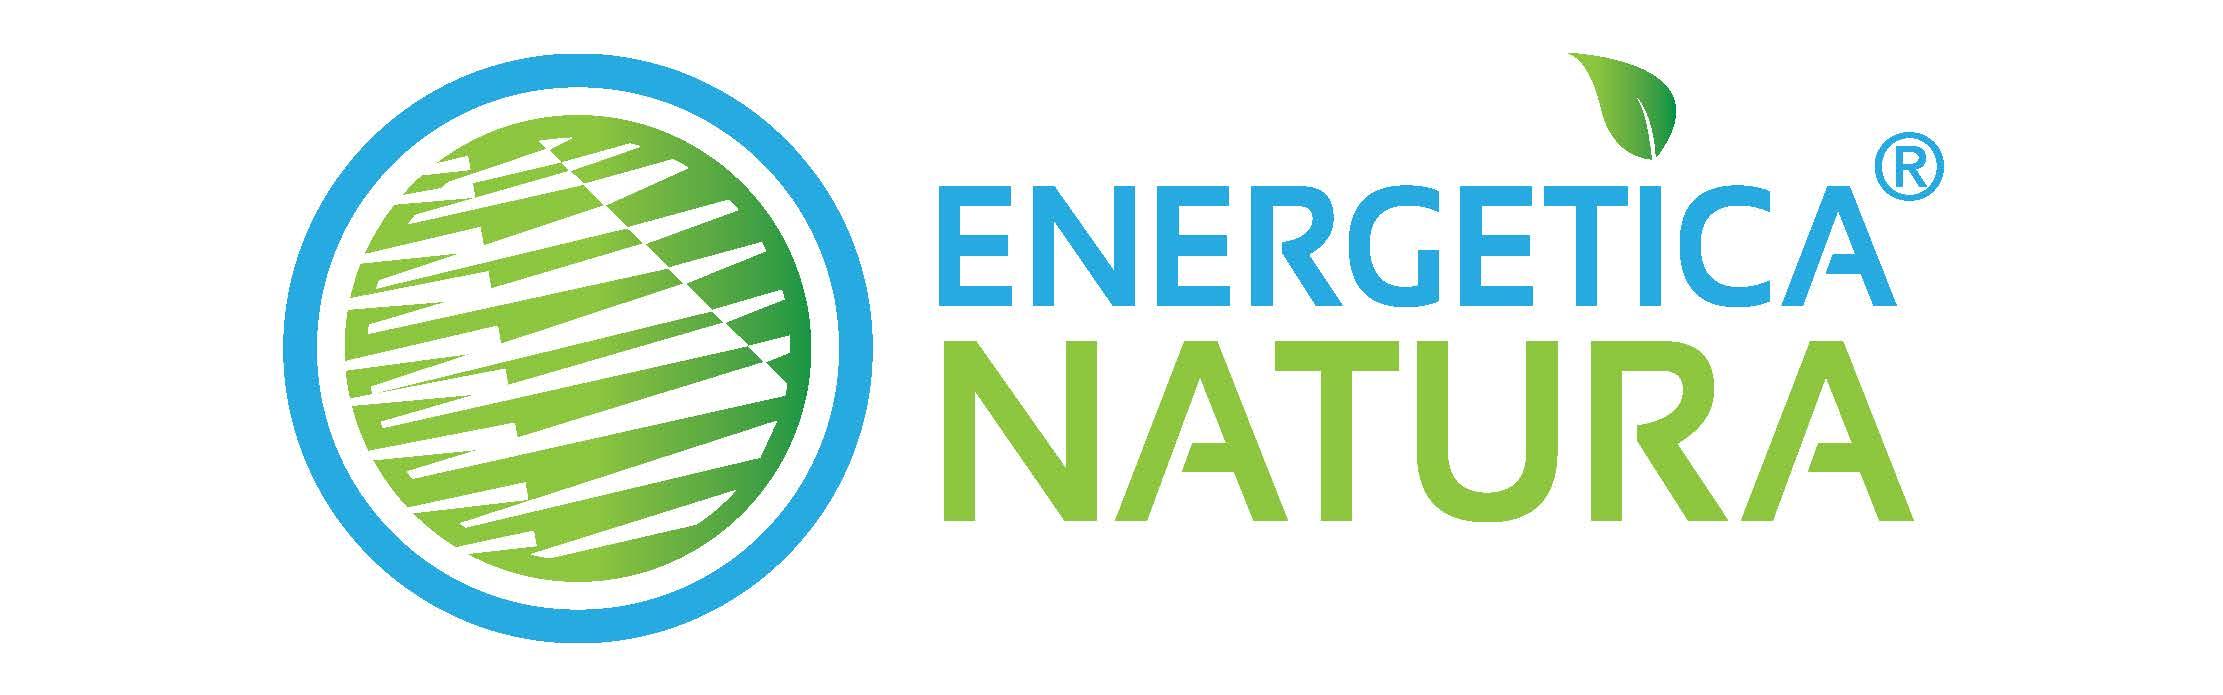 http://www.energeticanatura.com/